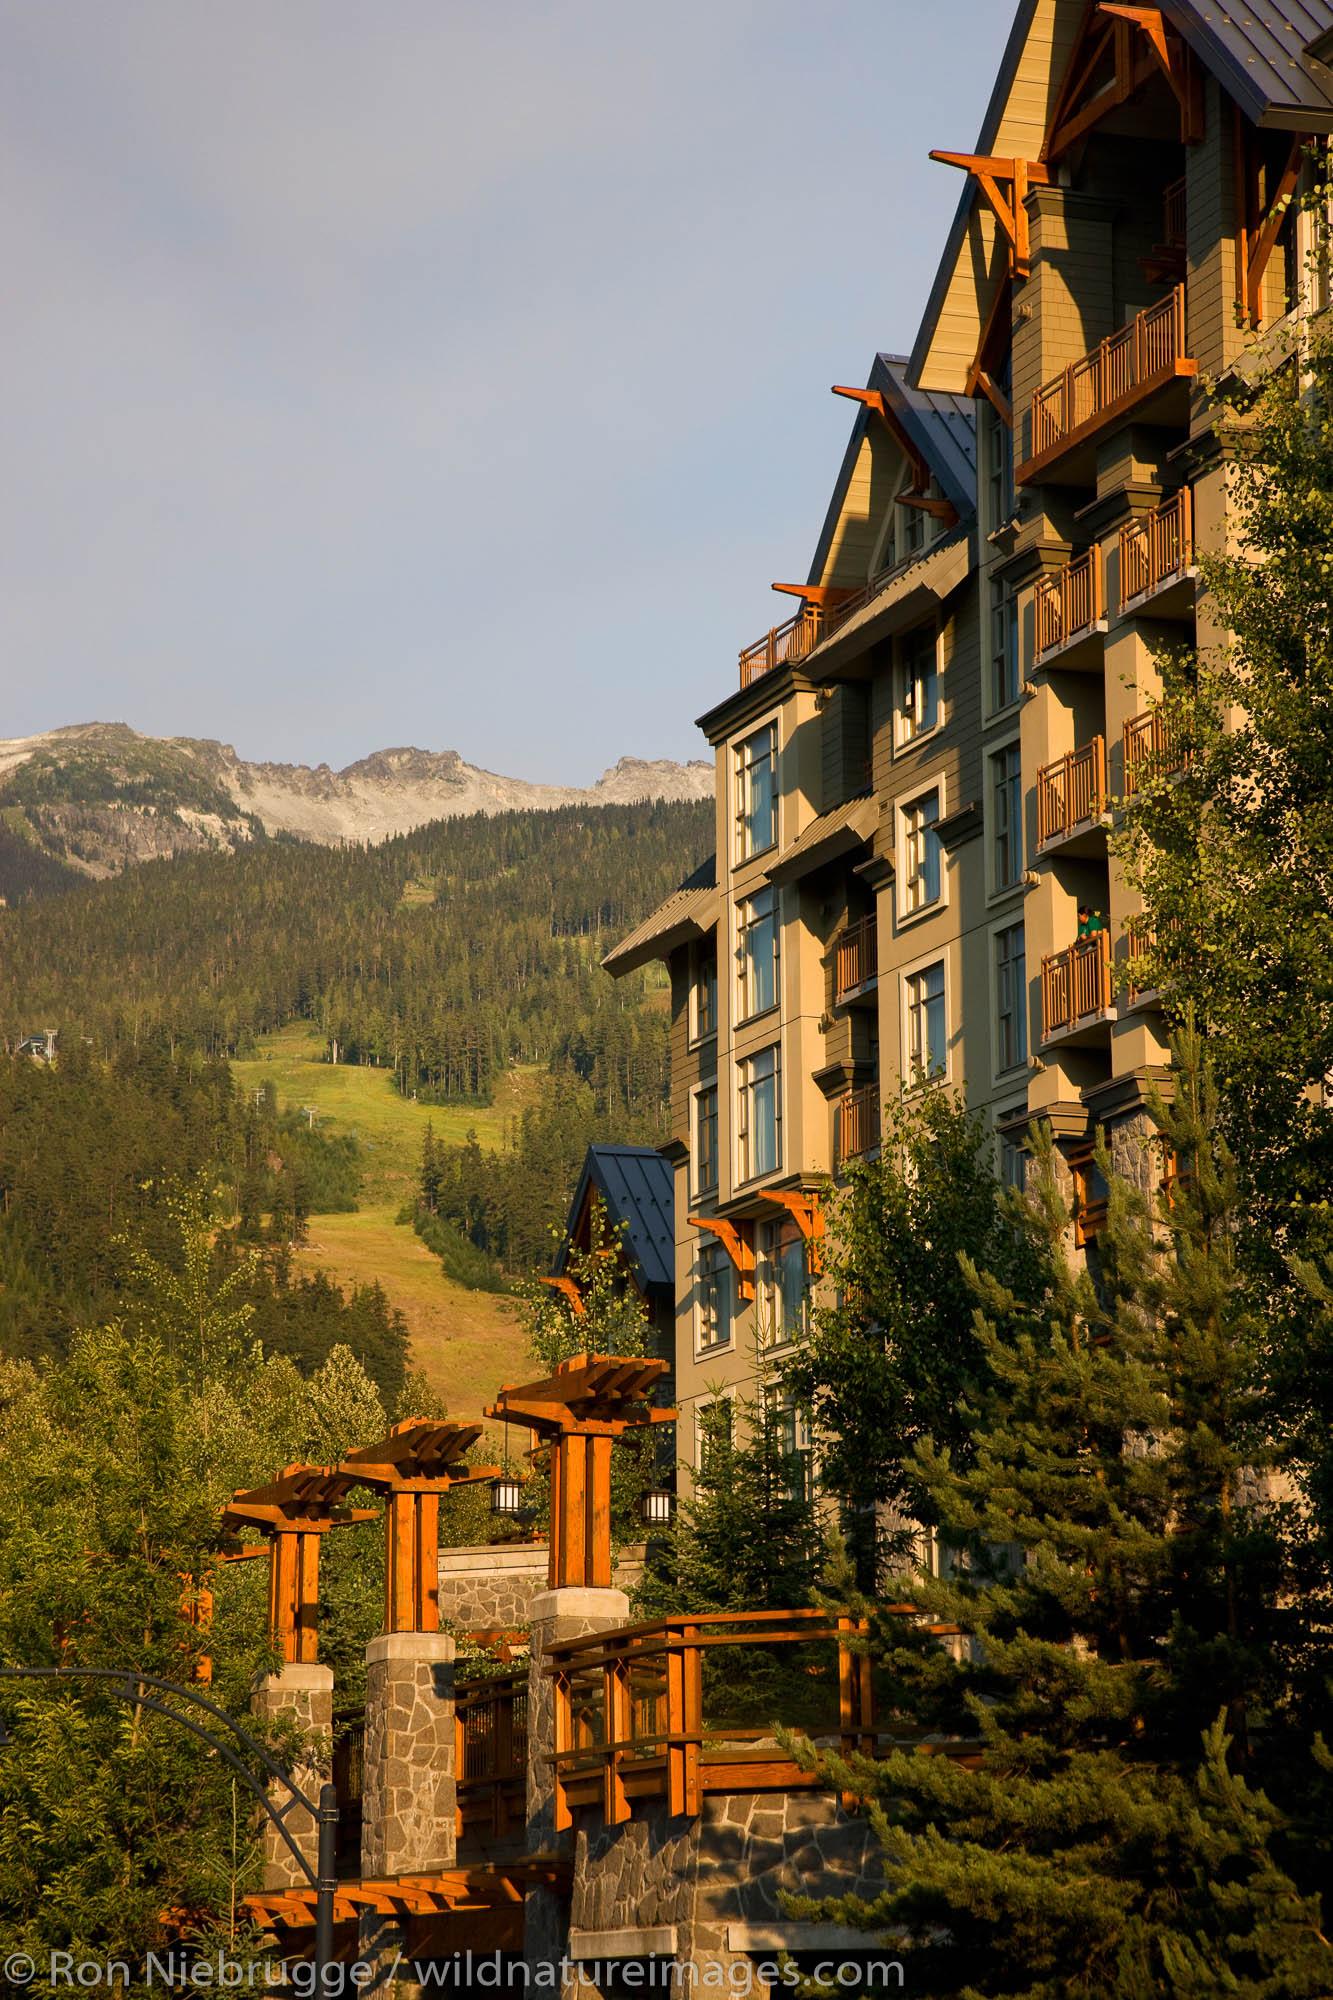 Pan Pacific Hotel, Whistler Village, Whistler, British Columbia, Canada